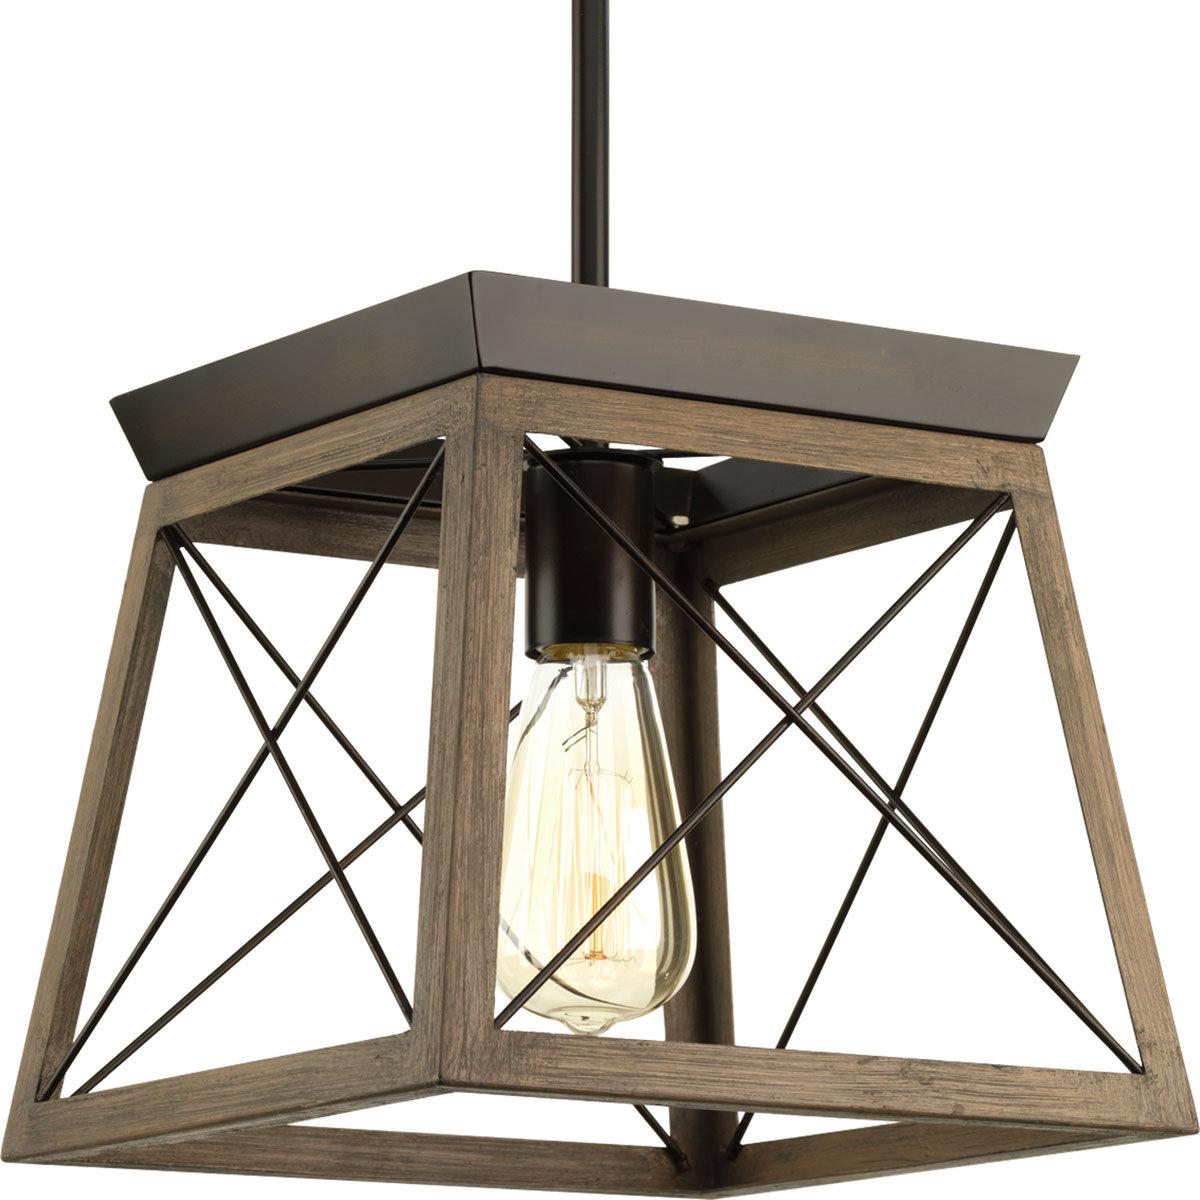 Delon 1 Light Lantern Geometric Pendant Inside Delon 1 Light Lantern Geometric Pendants (Photo 3 of 30)